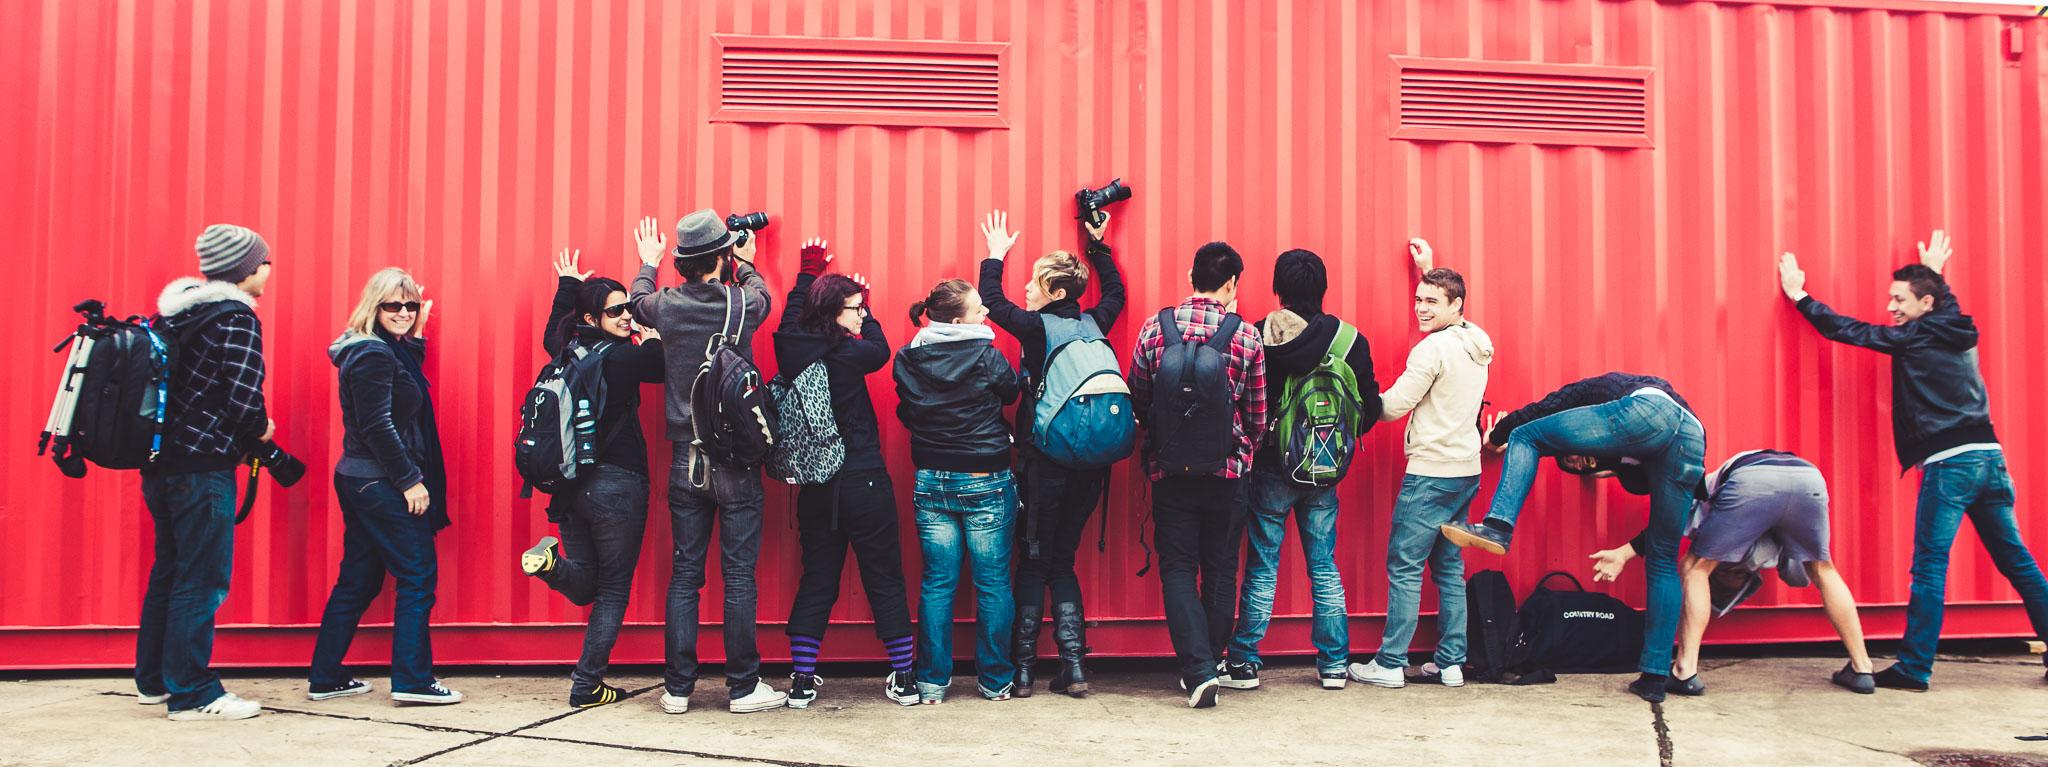 Melbourne Day Photography Workshop